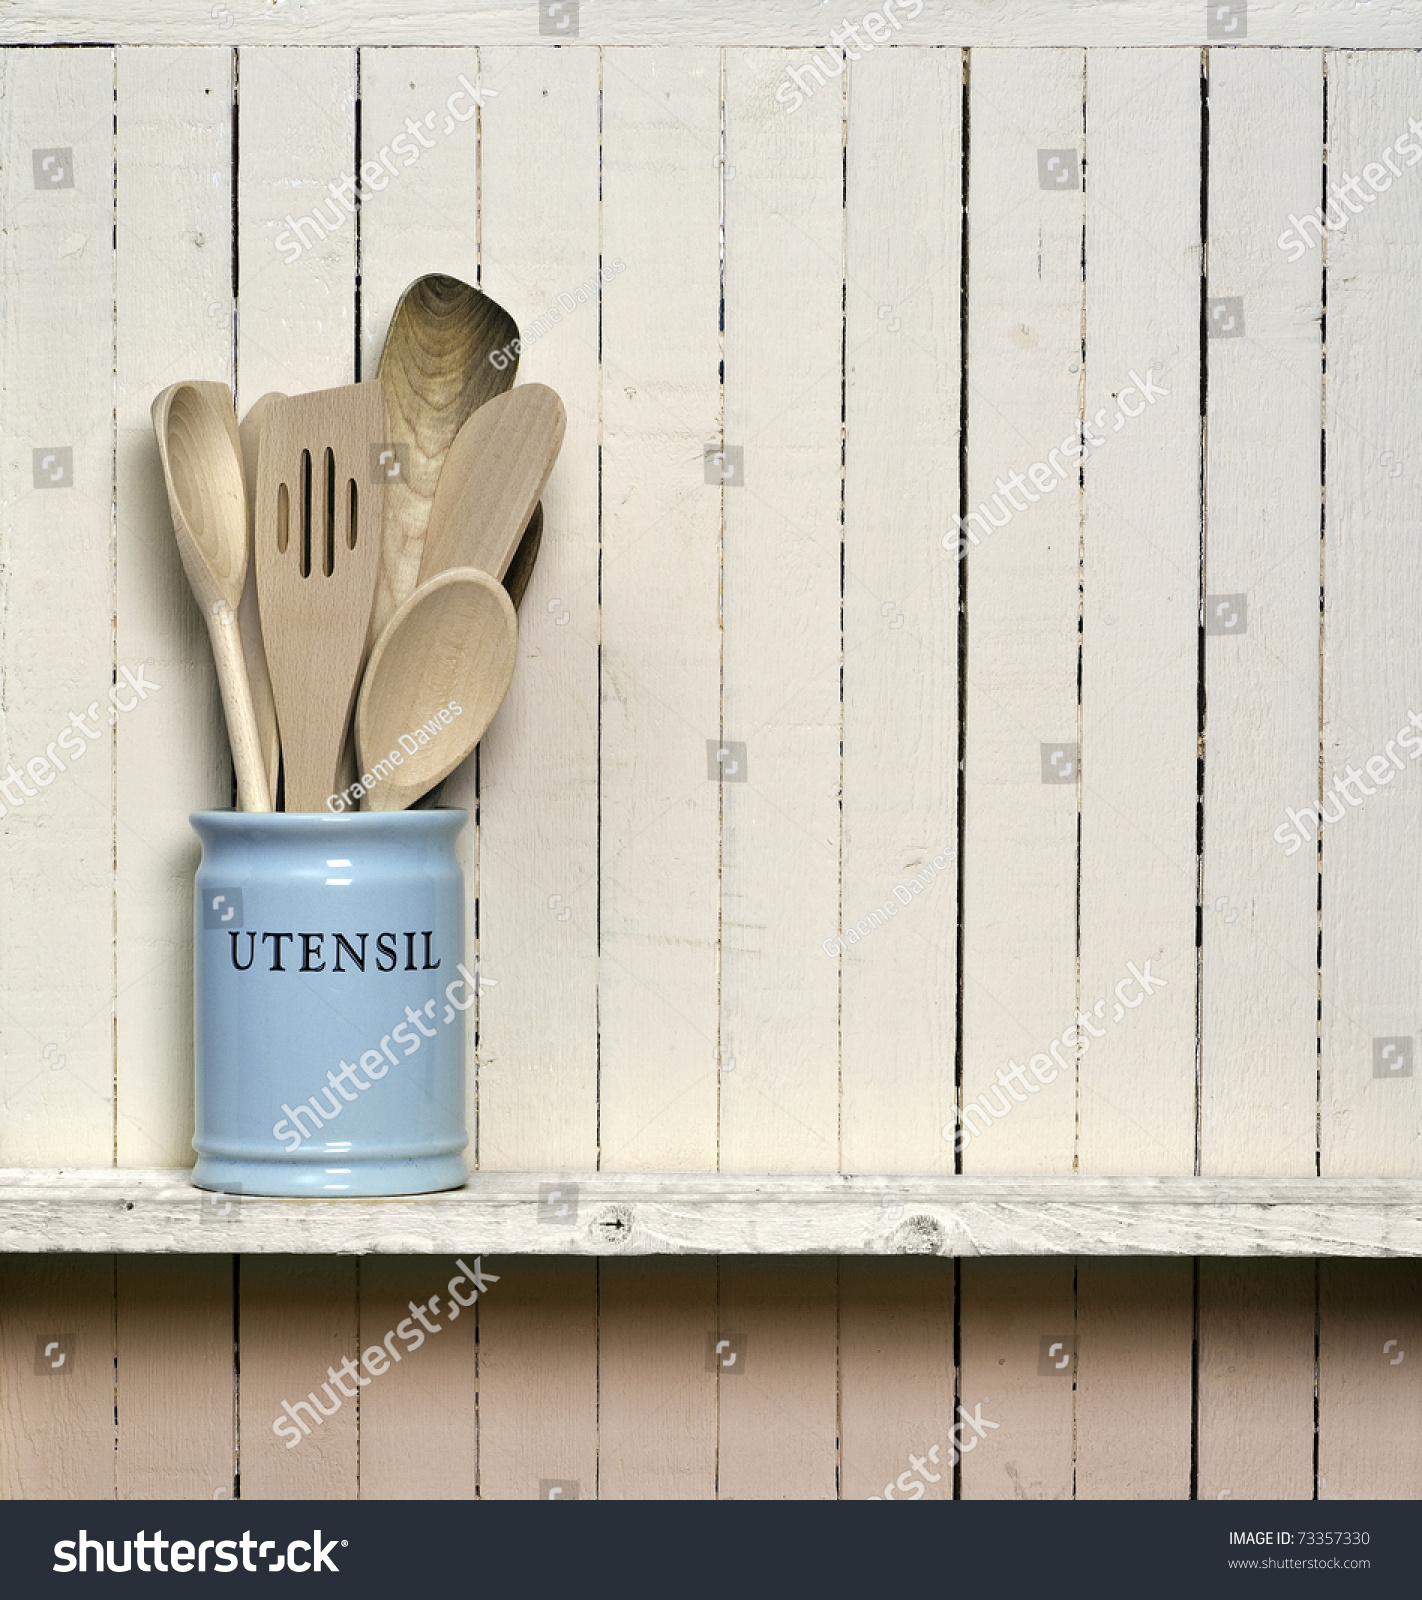 Kitchen Shelf Above Cooker: Kitchen Cooking Utensils Wooden Spatulas China Stock Photo